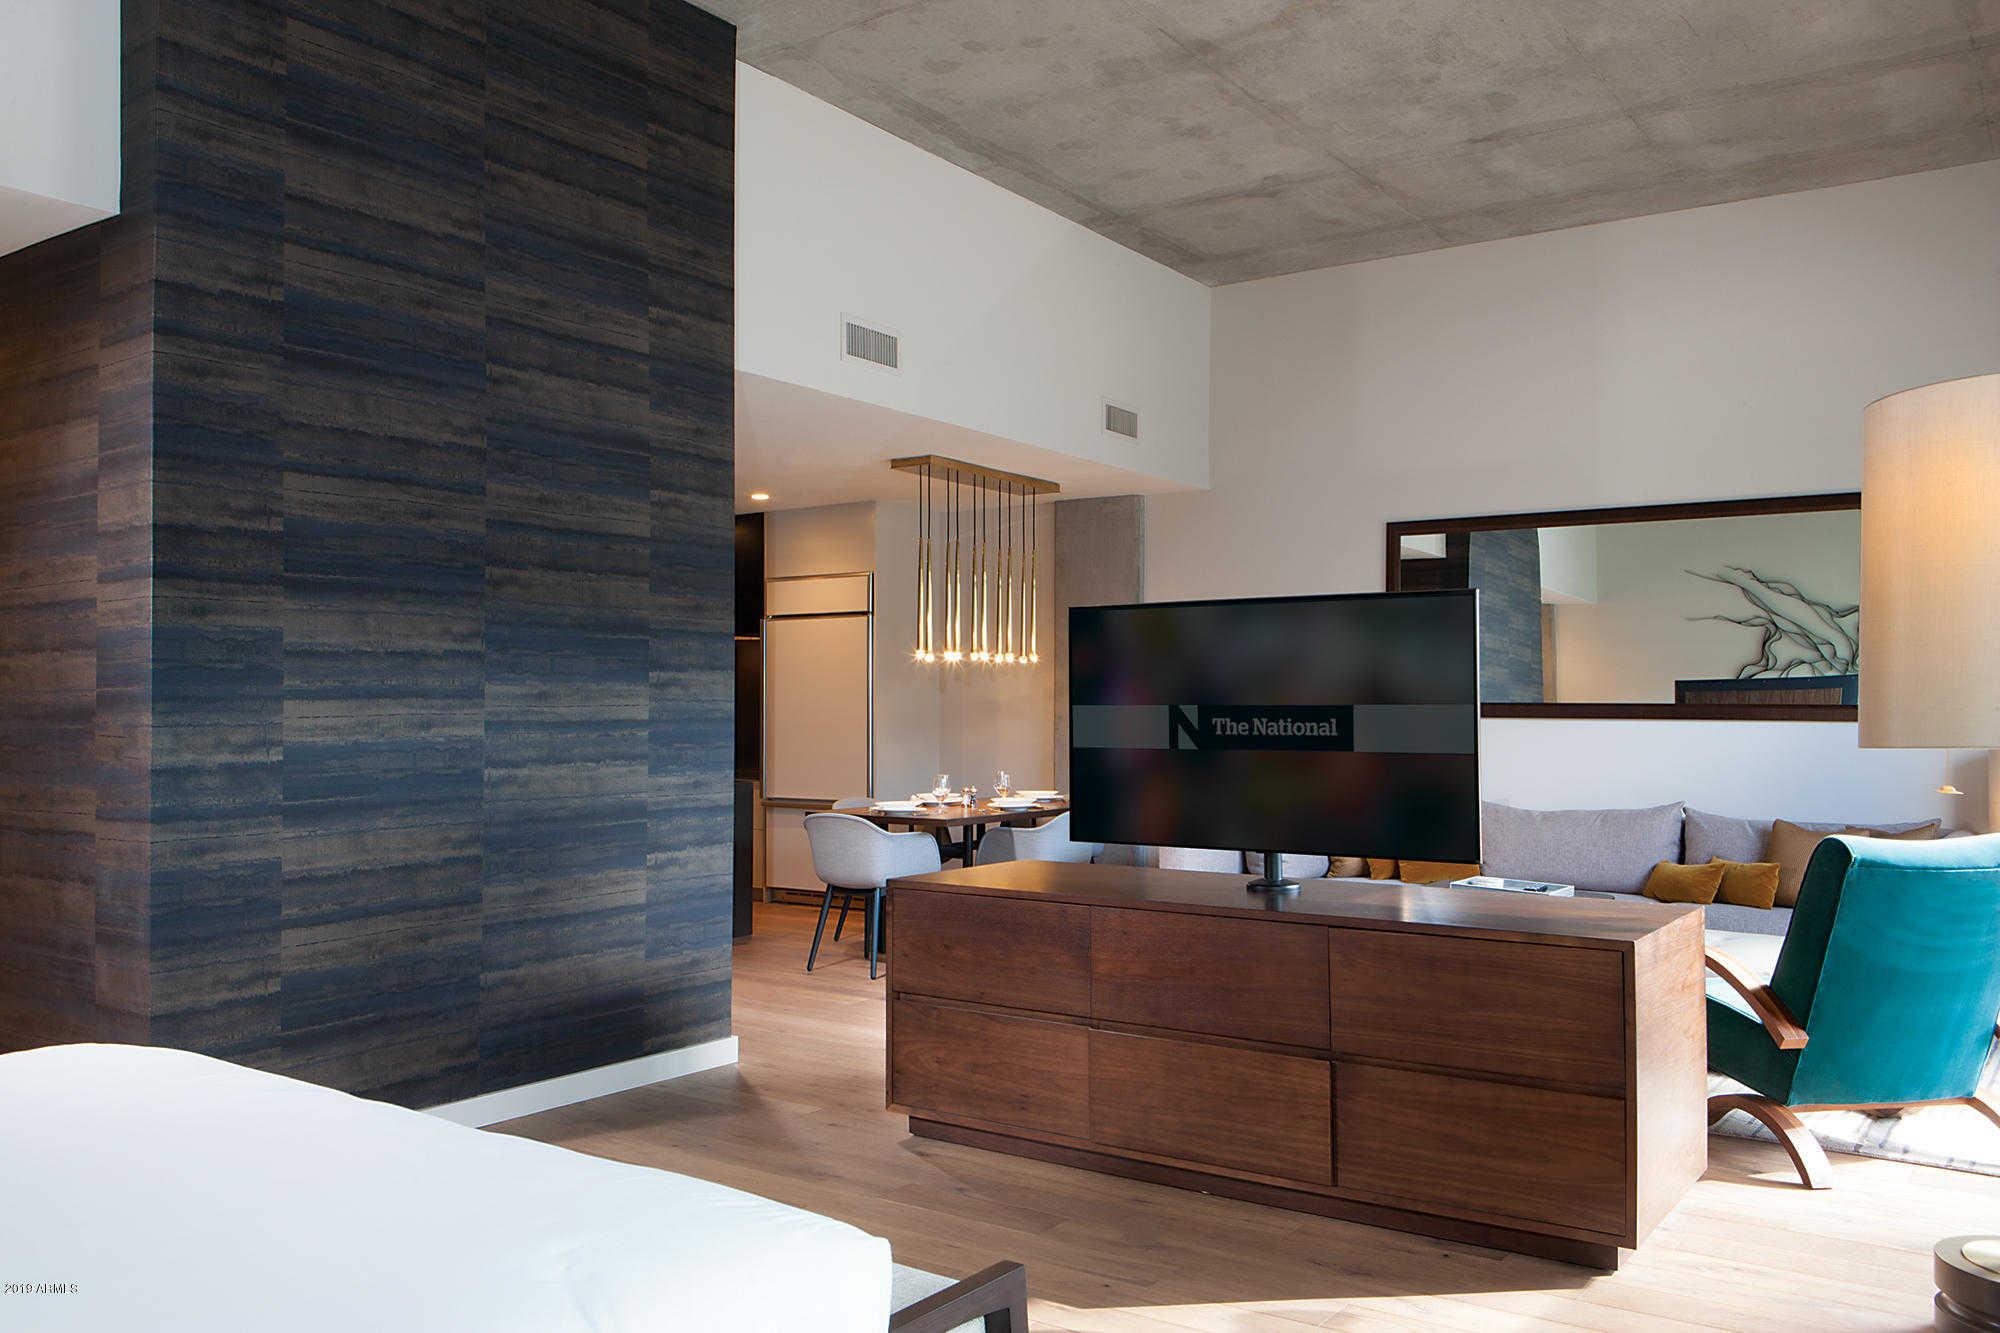 $856,000 - 0Br/1Ba -  for Sale in Mountain Shadows Resort - Condominium Hotel, Paradise Valley